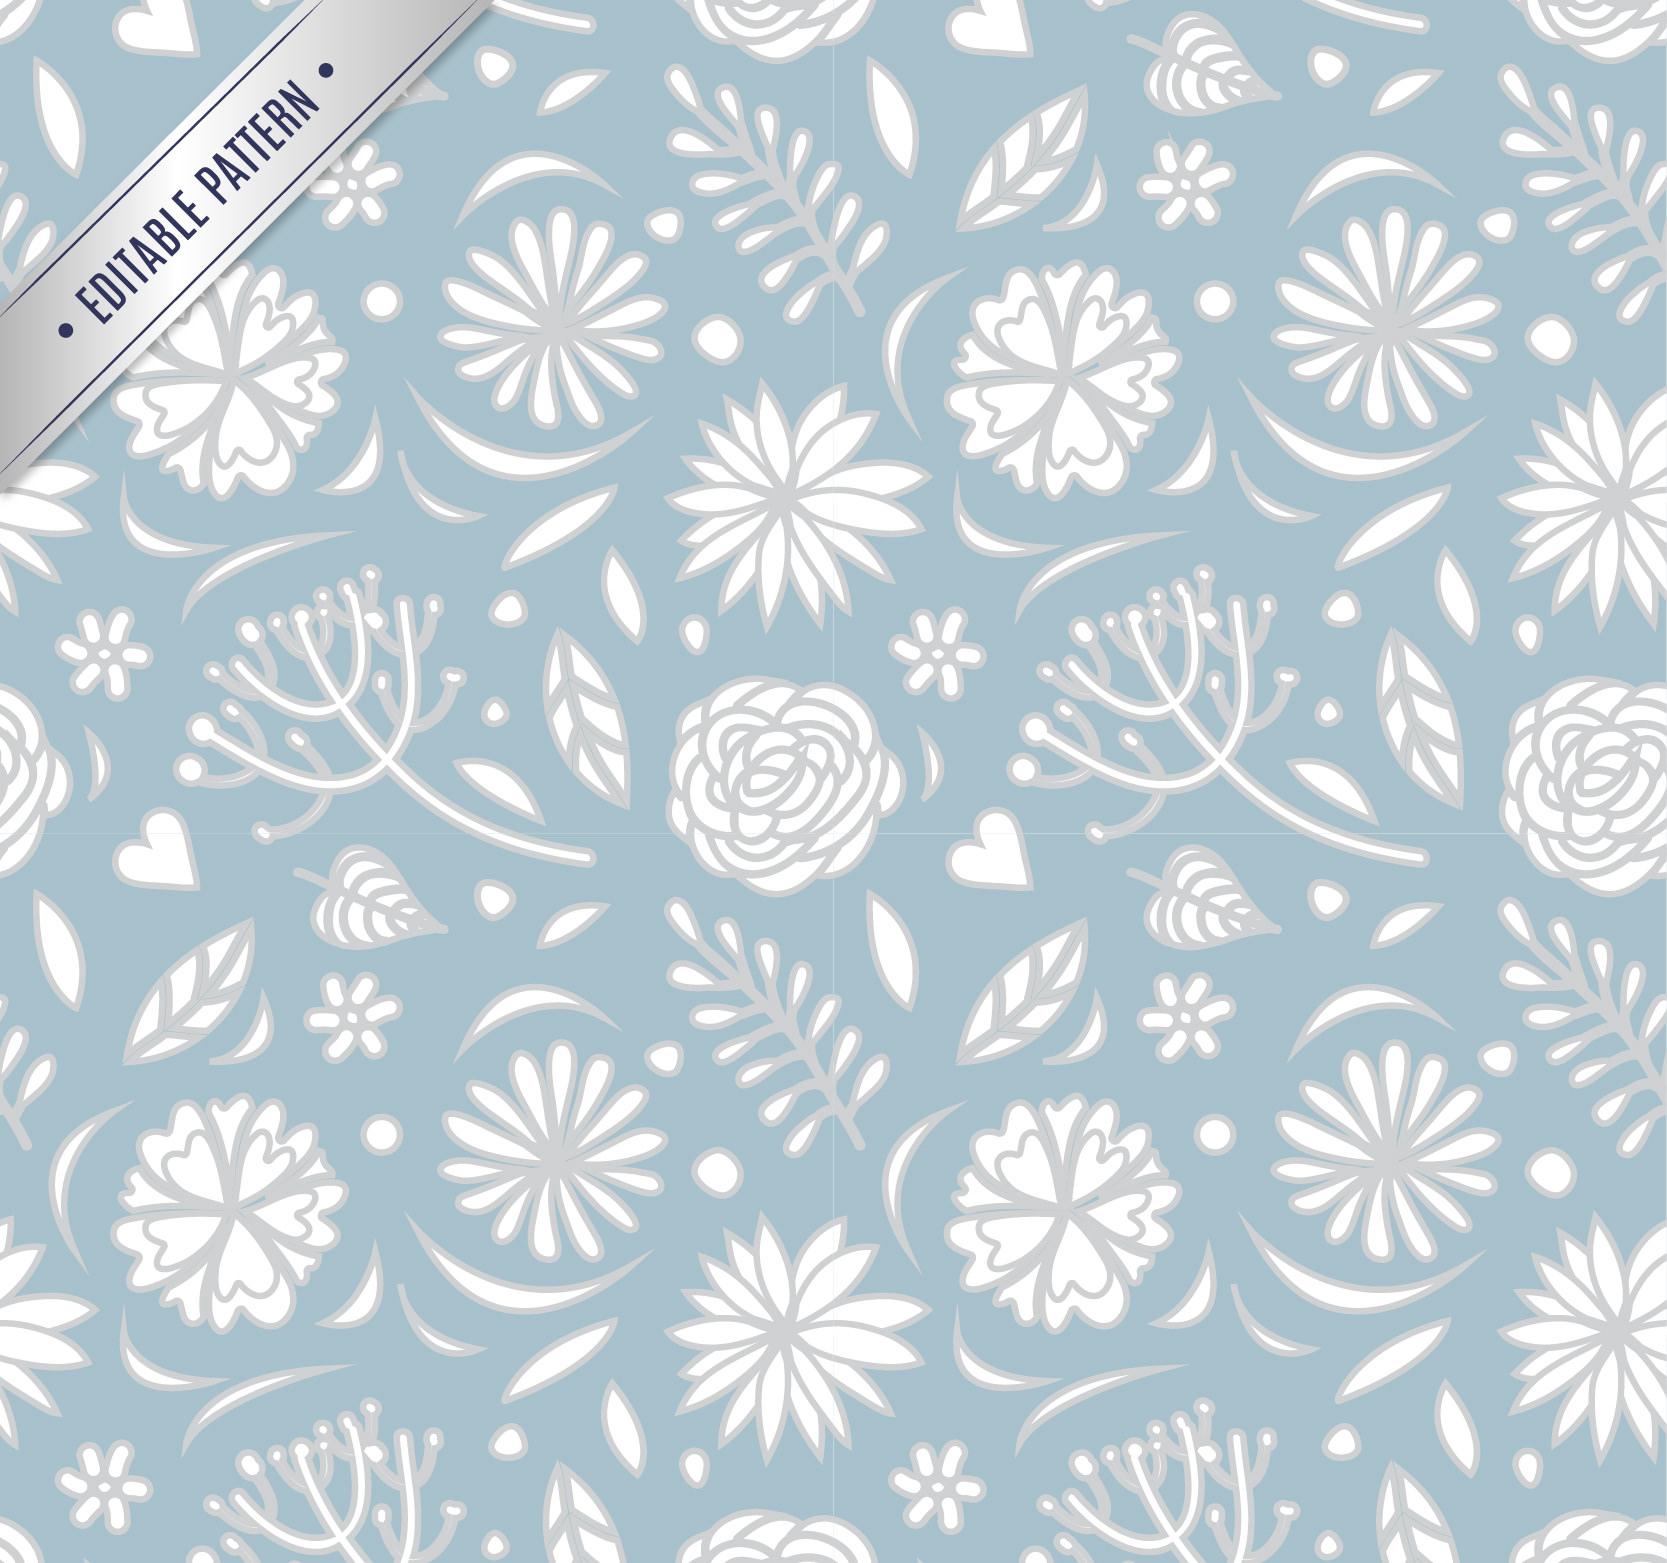 Free 20 Vintage Floral Patterns In Psd